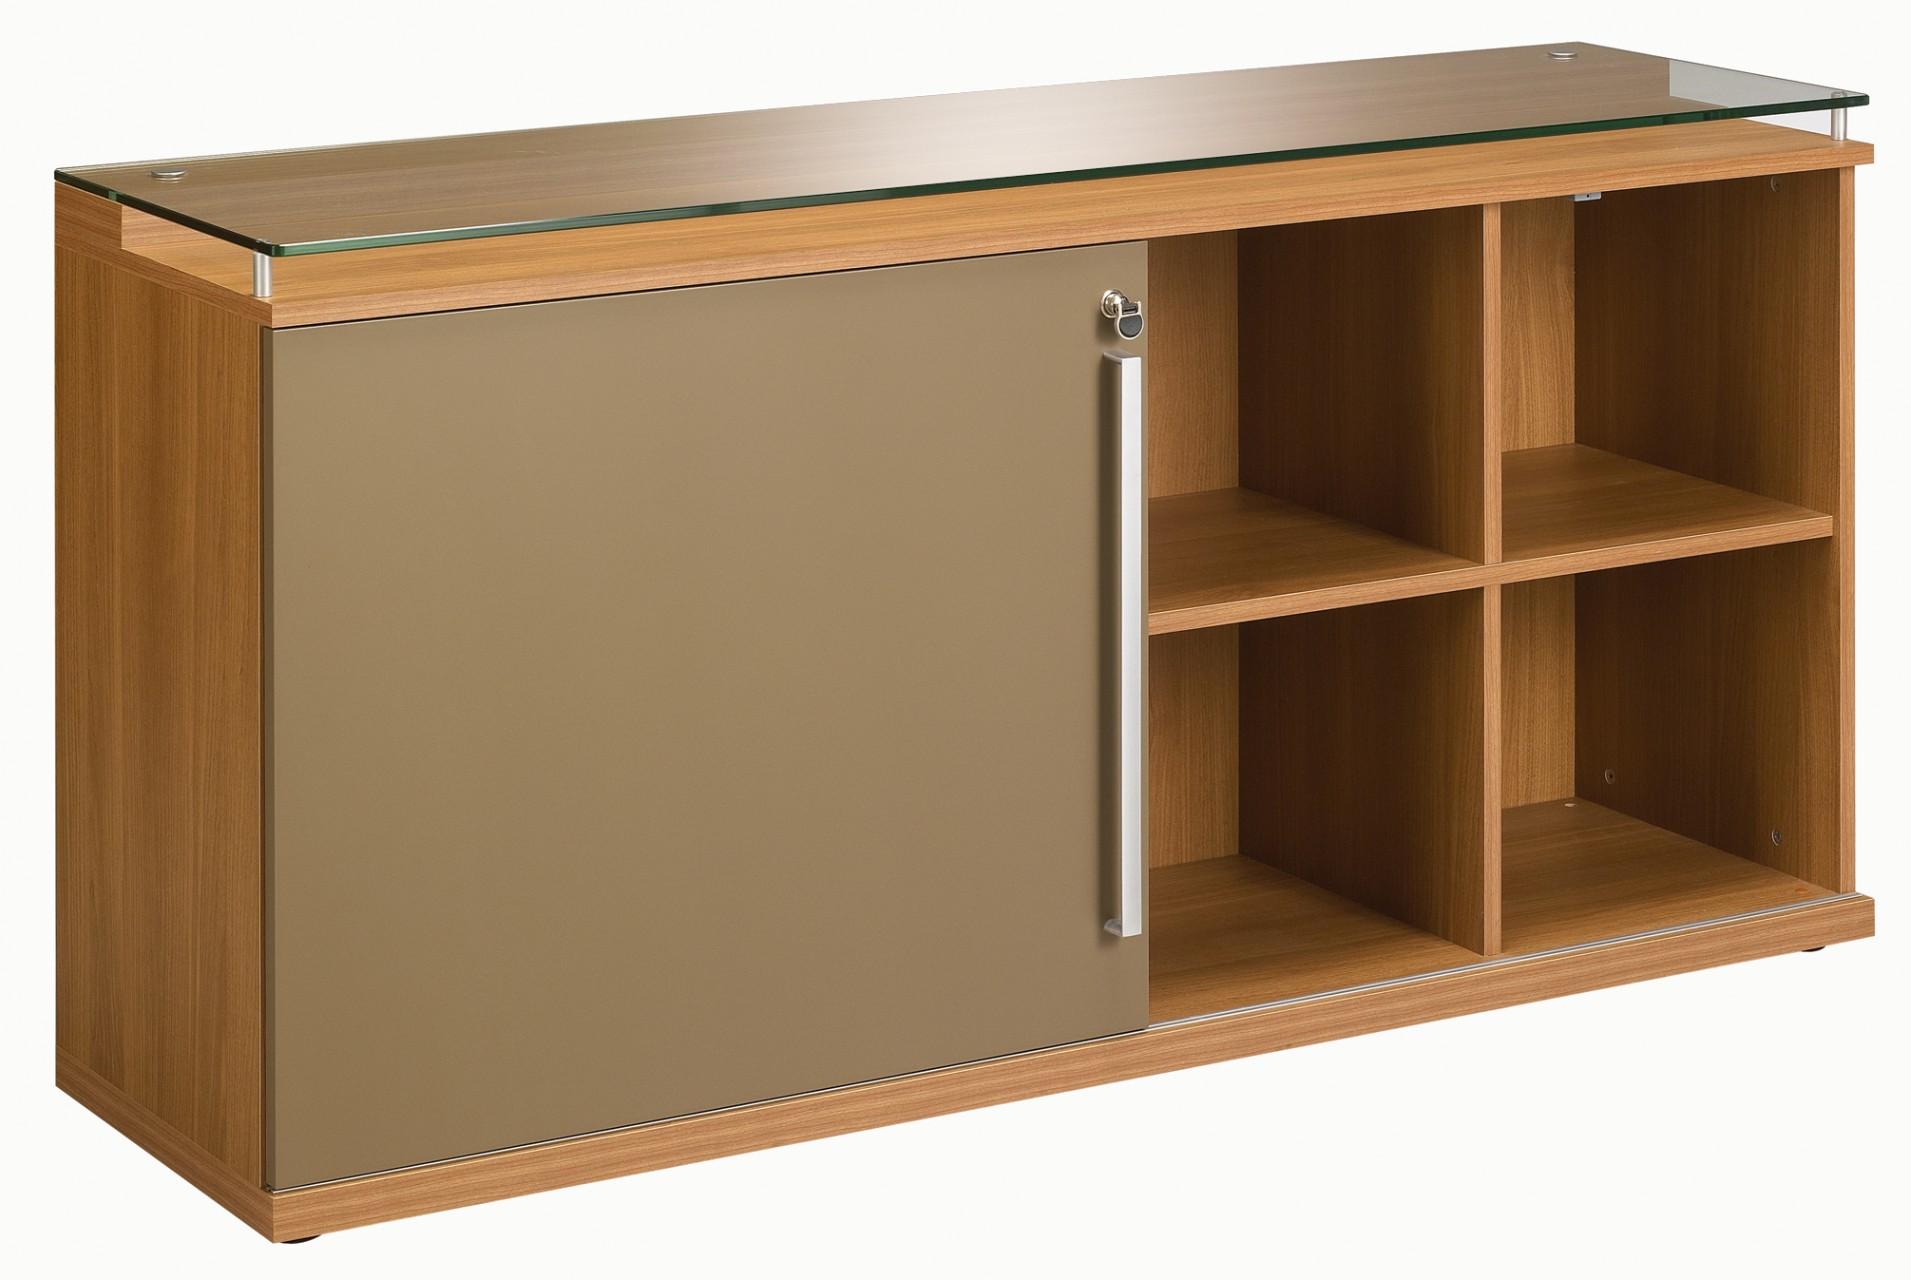 armoire rangement porte coulissante. Black Bedroom Furniture Sets. Home Design Ideas